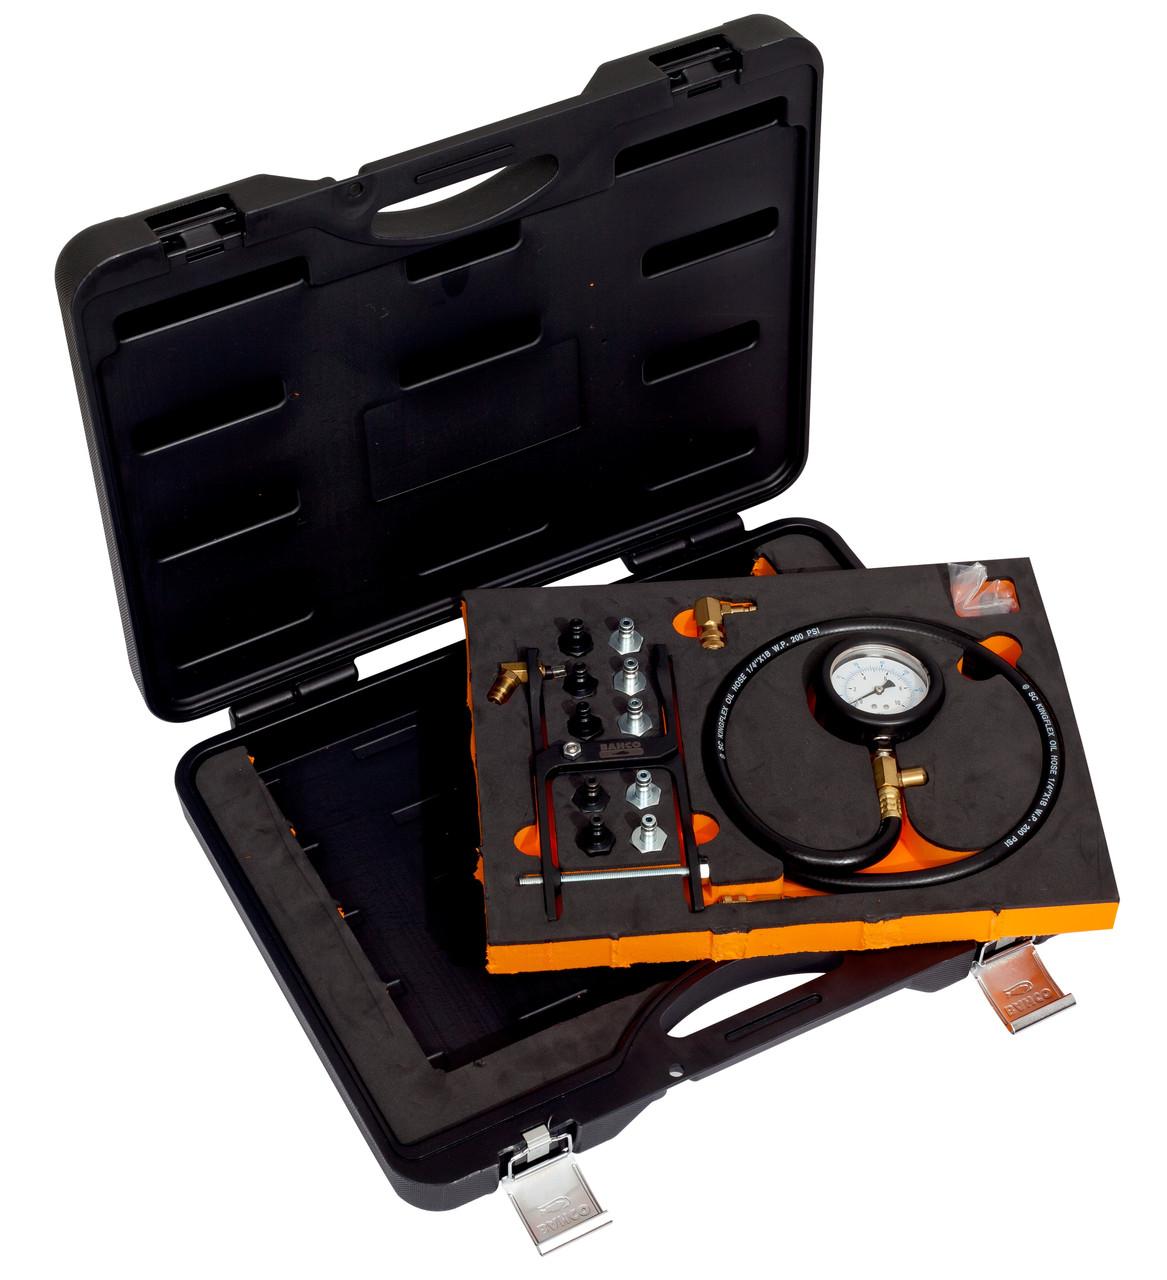 Тестер проверки давления масла в двигателе, Bahco,BE52003